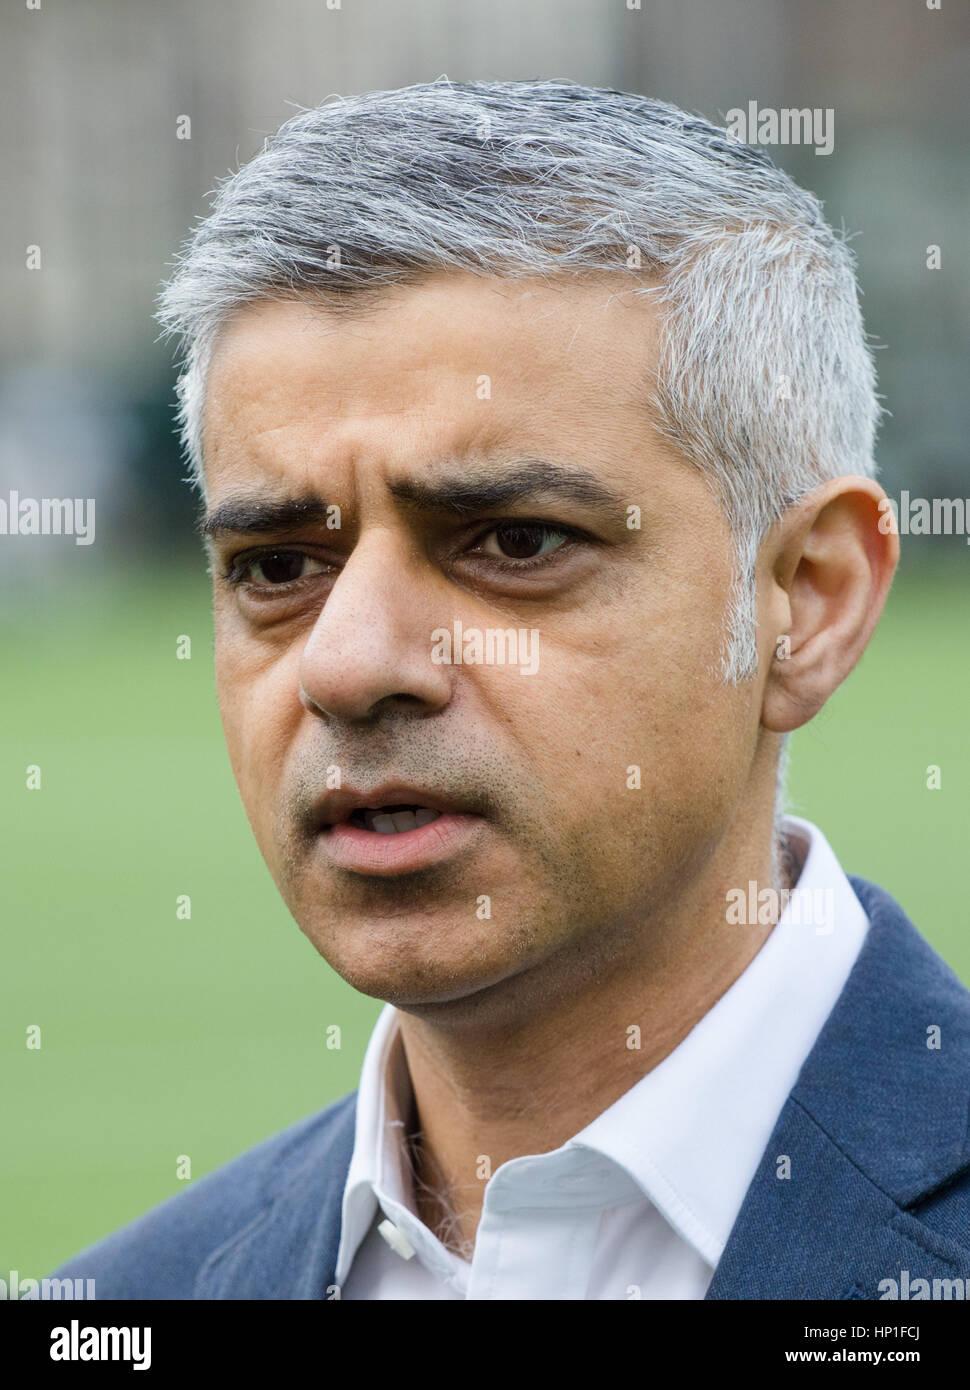 London, UK. 17th Feb, 2017. Coram's Fields Youth Centre, London, February 17th 2017. Mayor of London Sadiq Khan - Stock Image